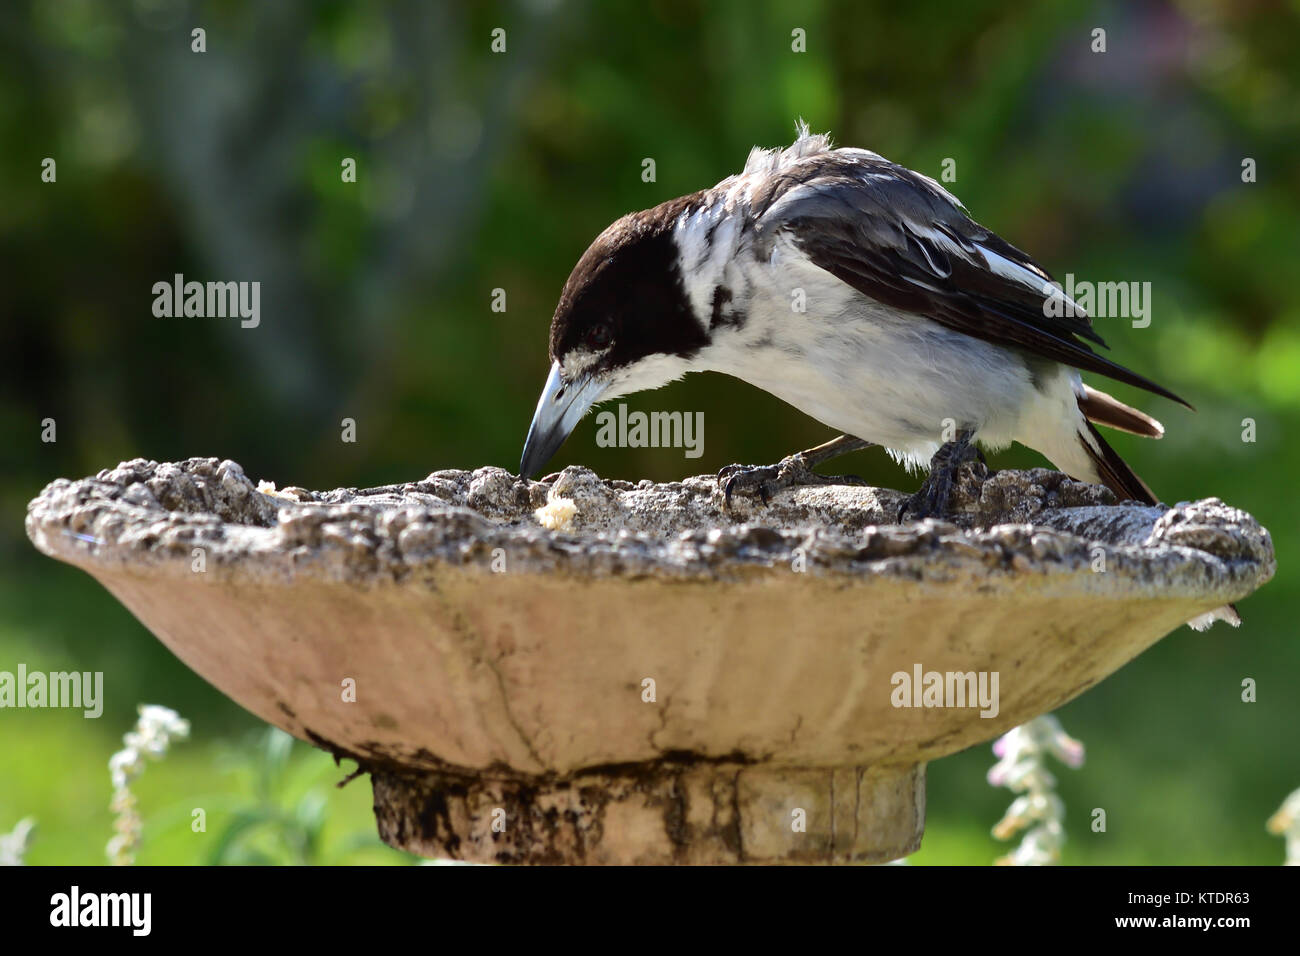 An Australian Grey Butcherbird dropping food into a Birdbath - Stock Image